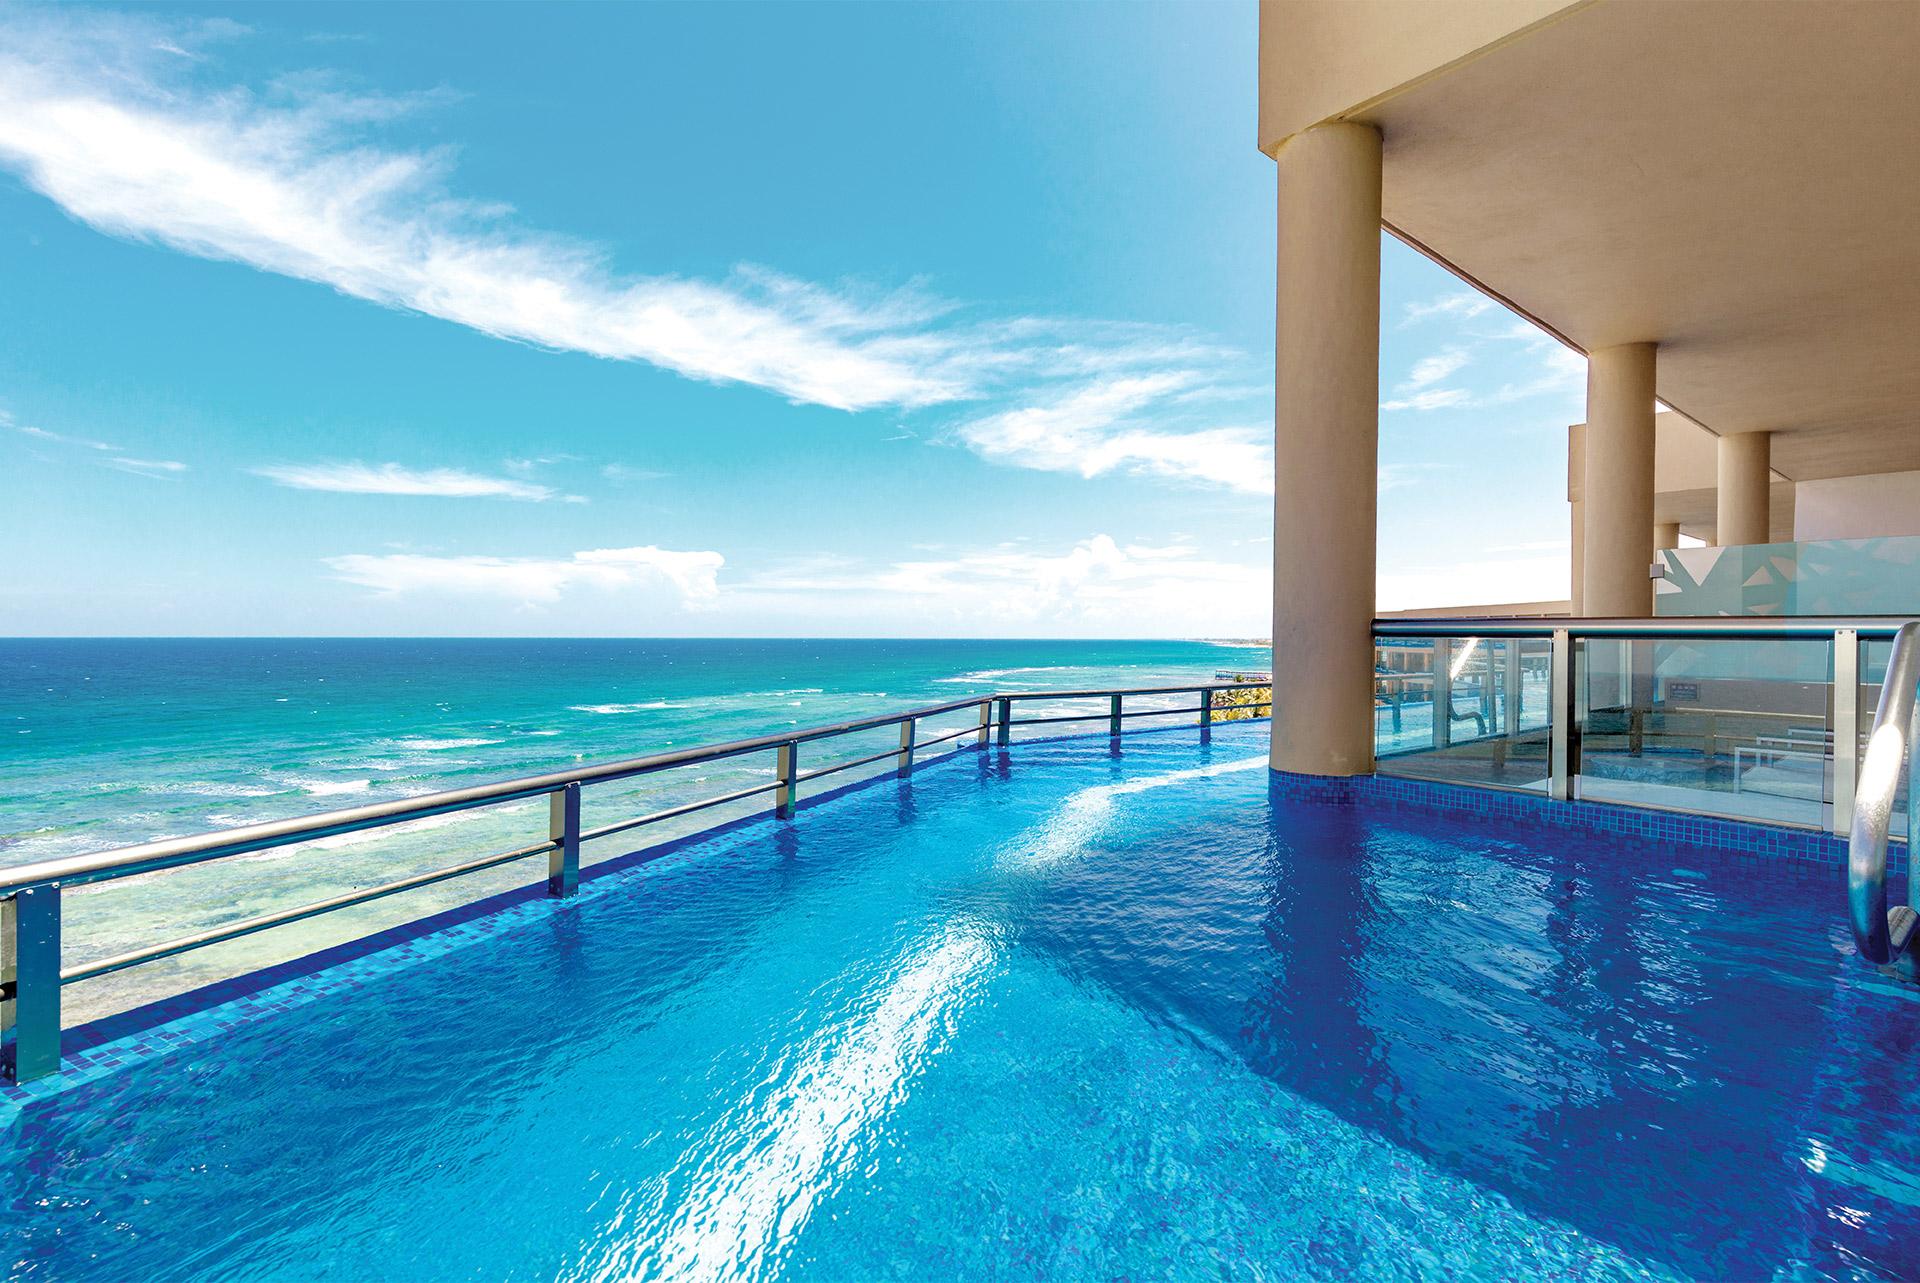 La piscine à étage du El Dorado Seaside Suites